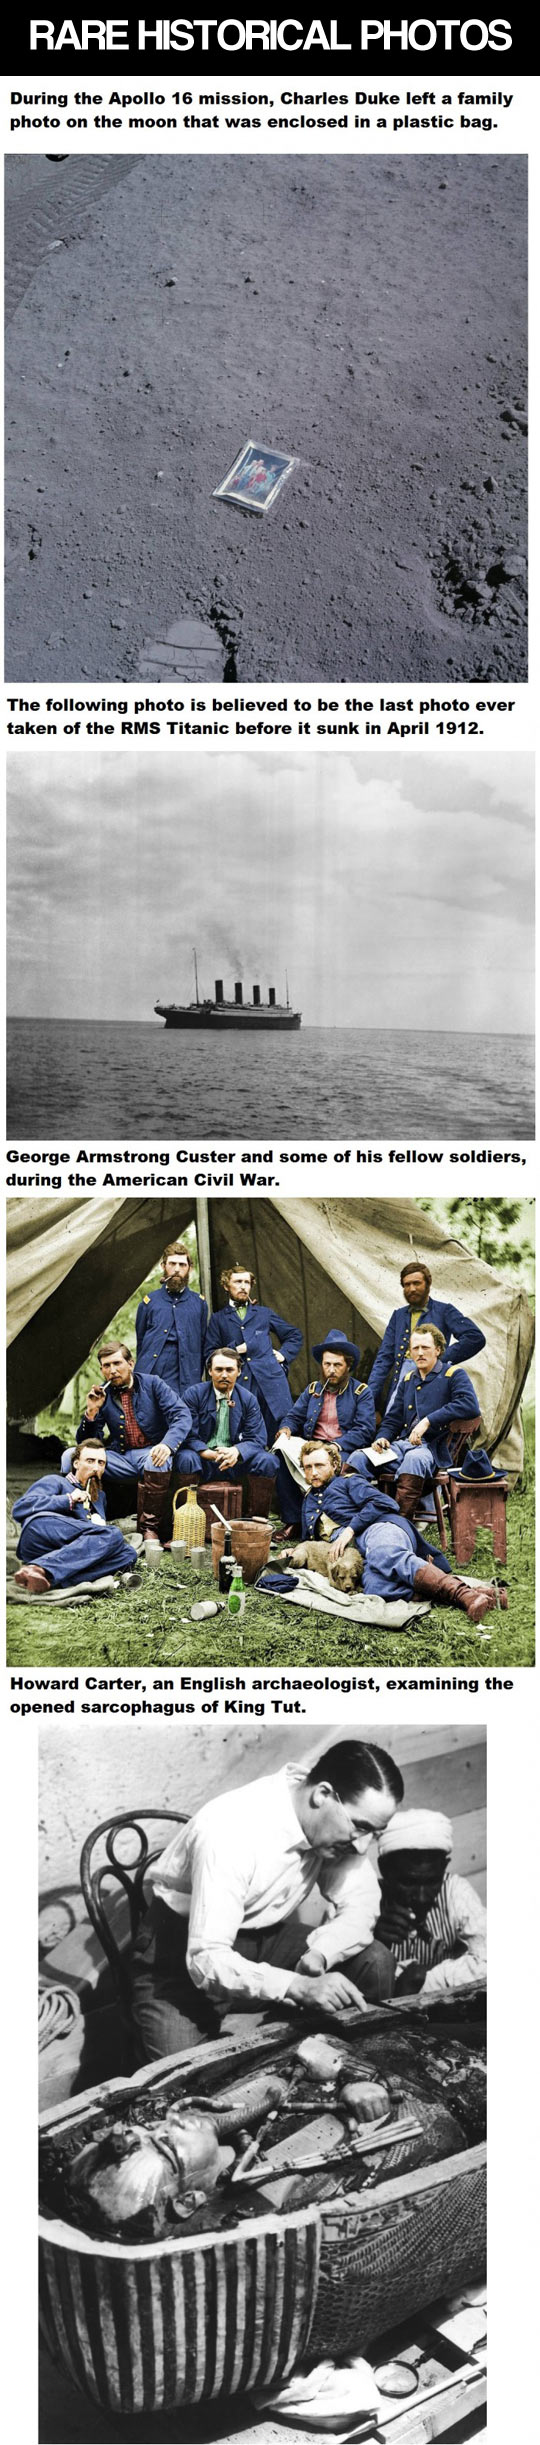 Rare historical photographs...